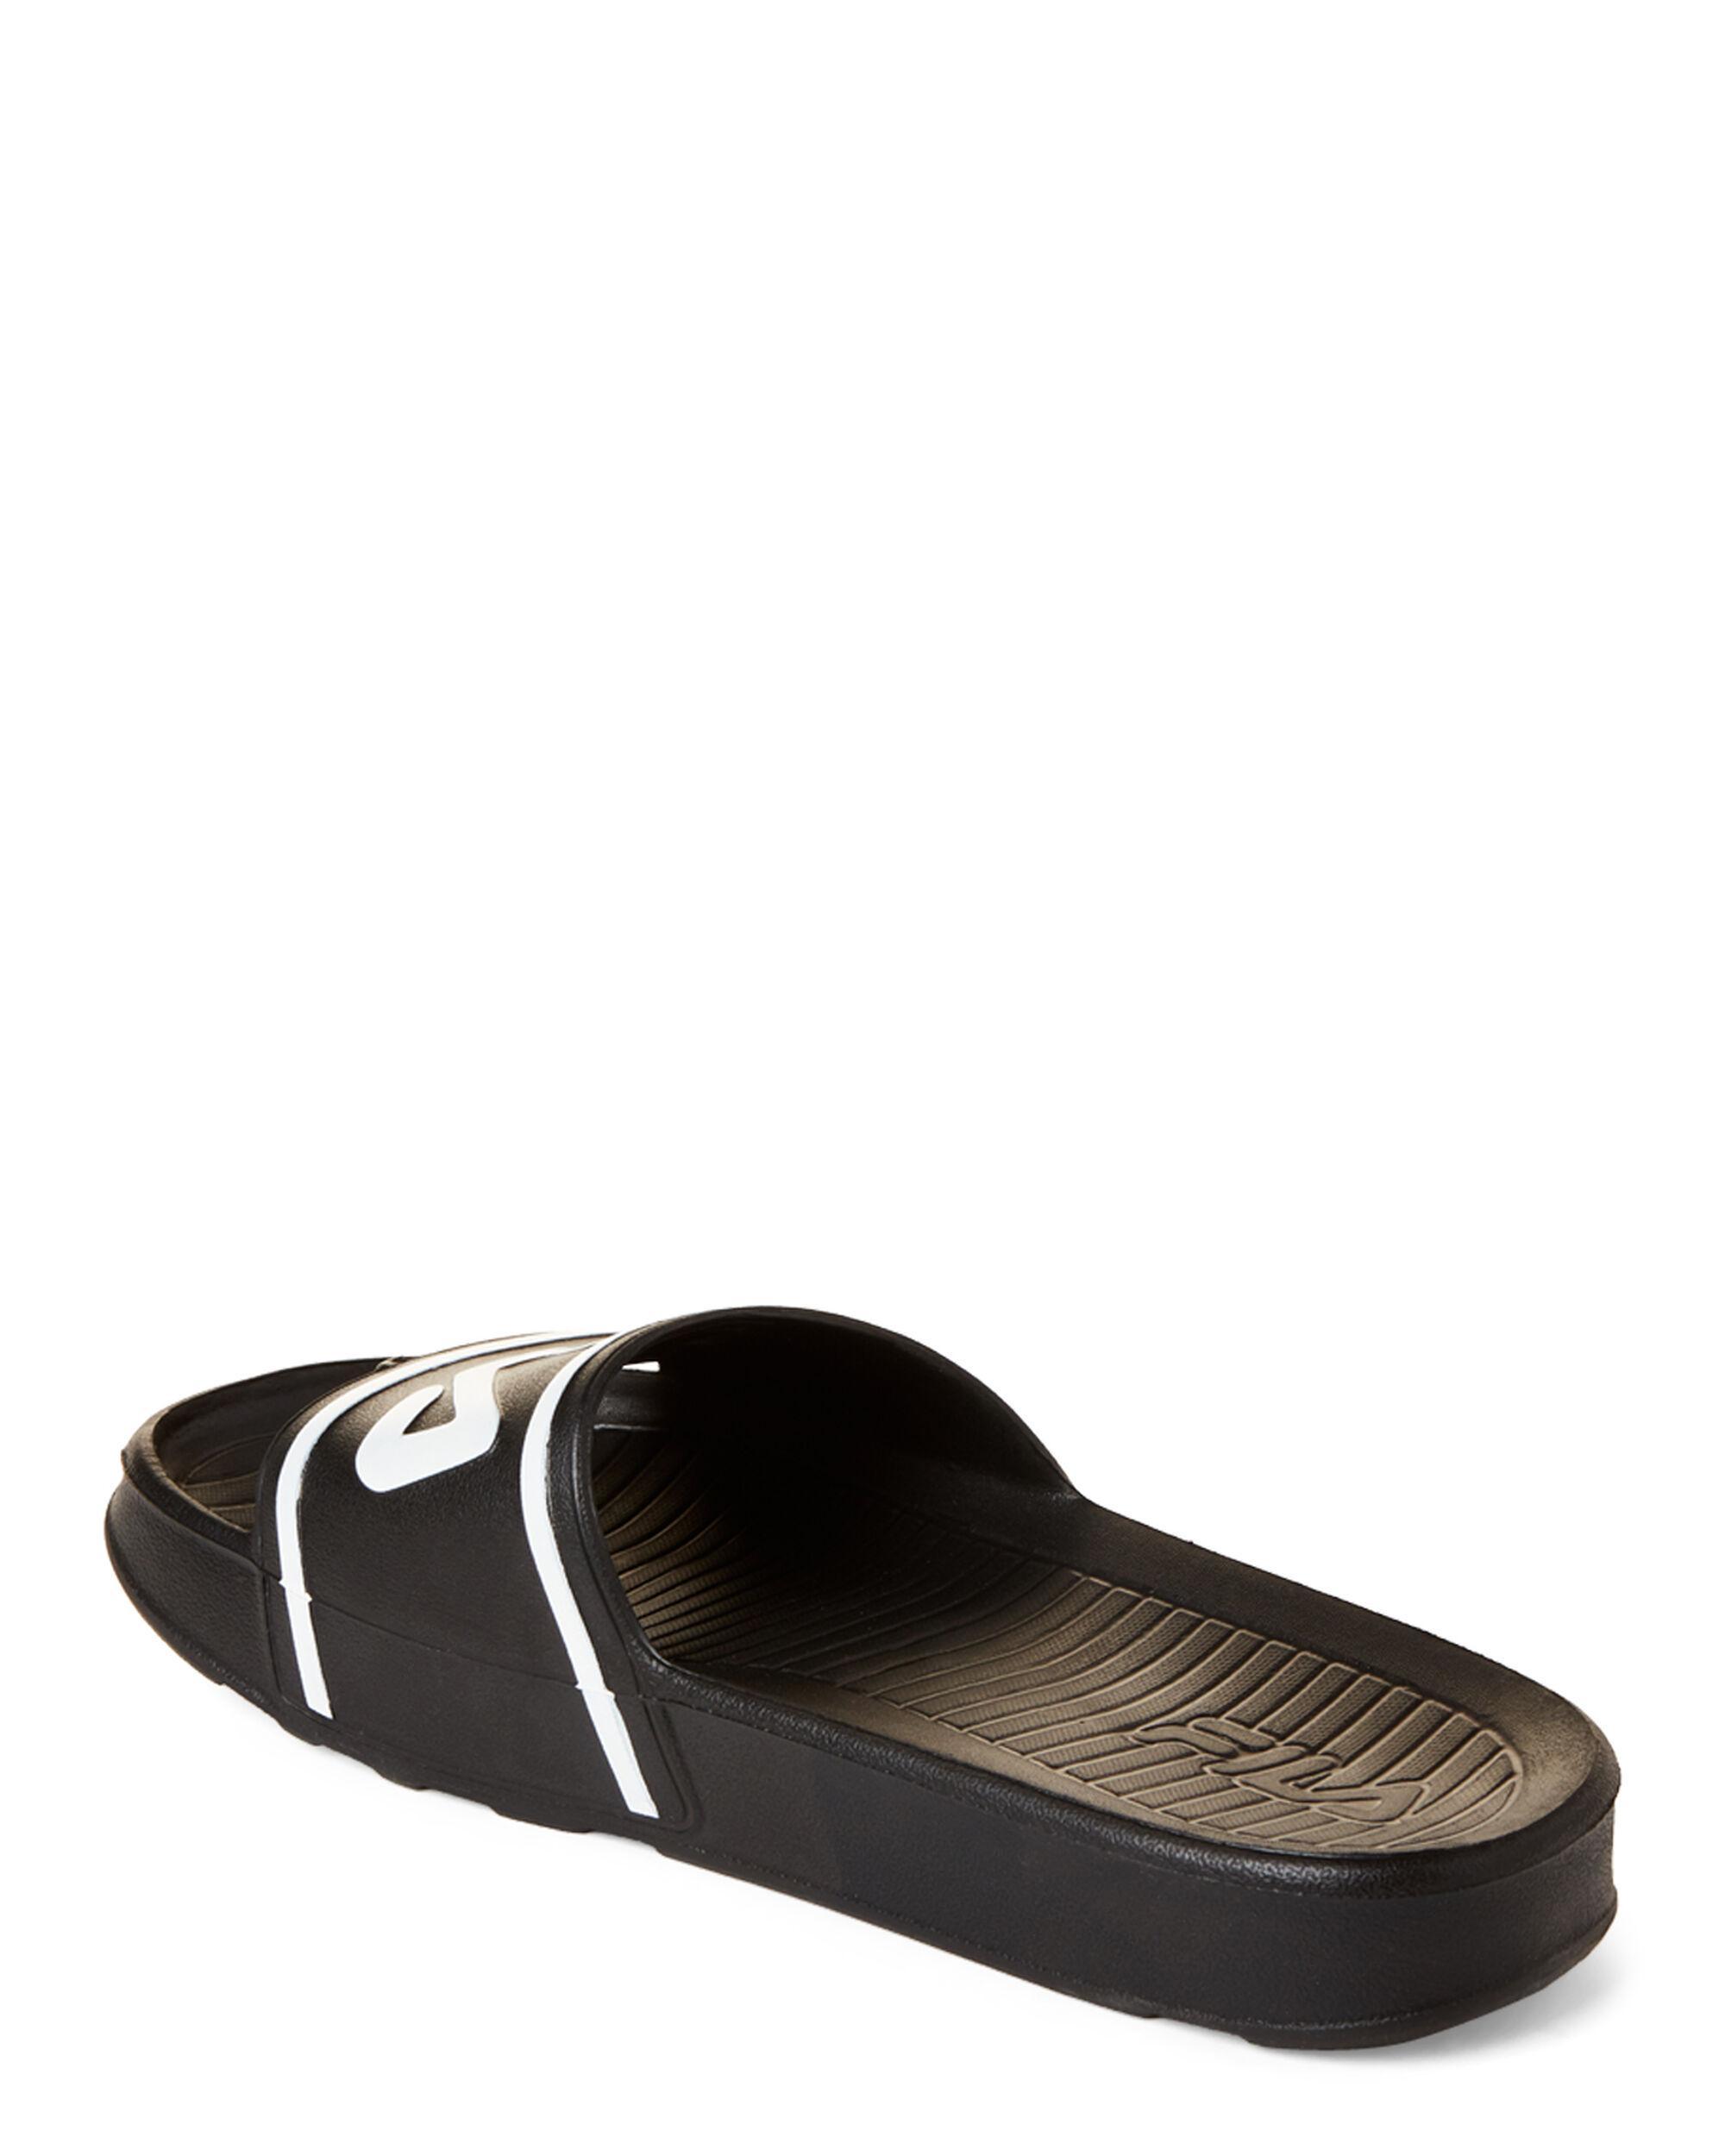 Fila Men/'s Driftonic Sandals Free shipping